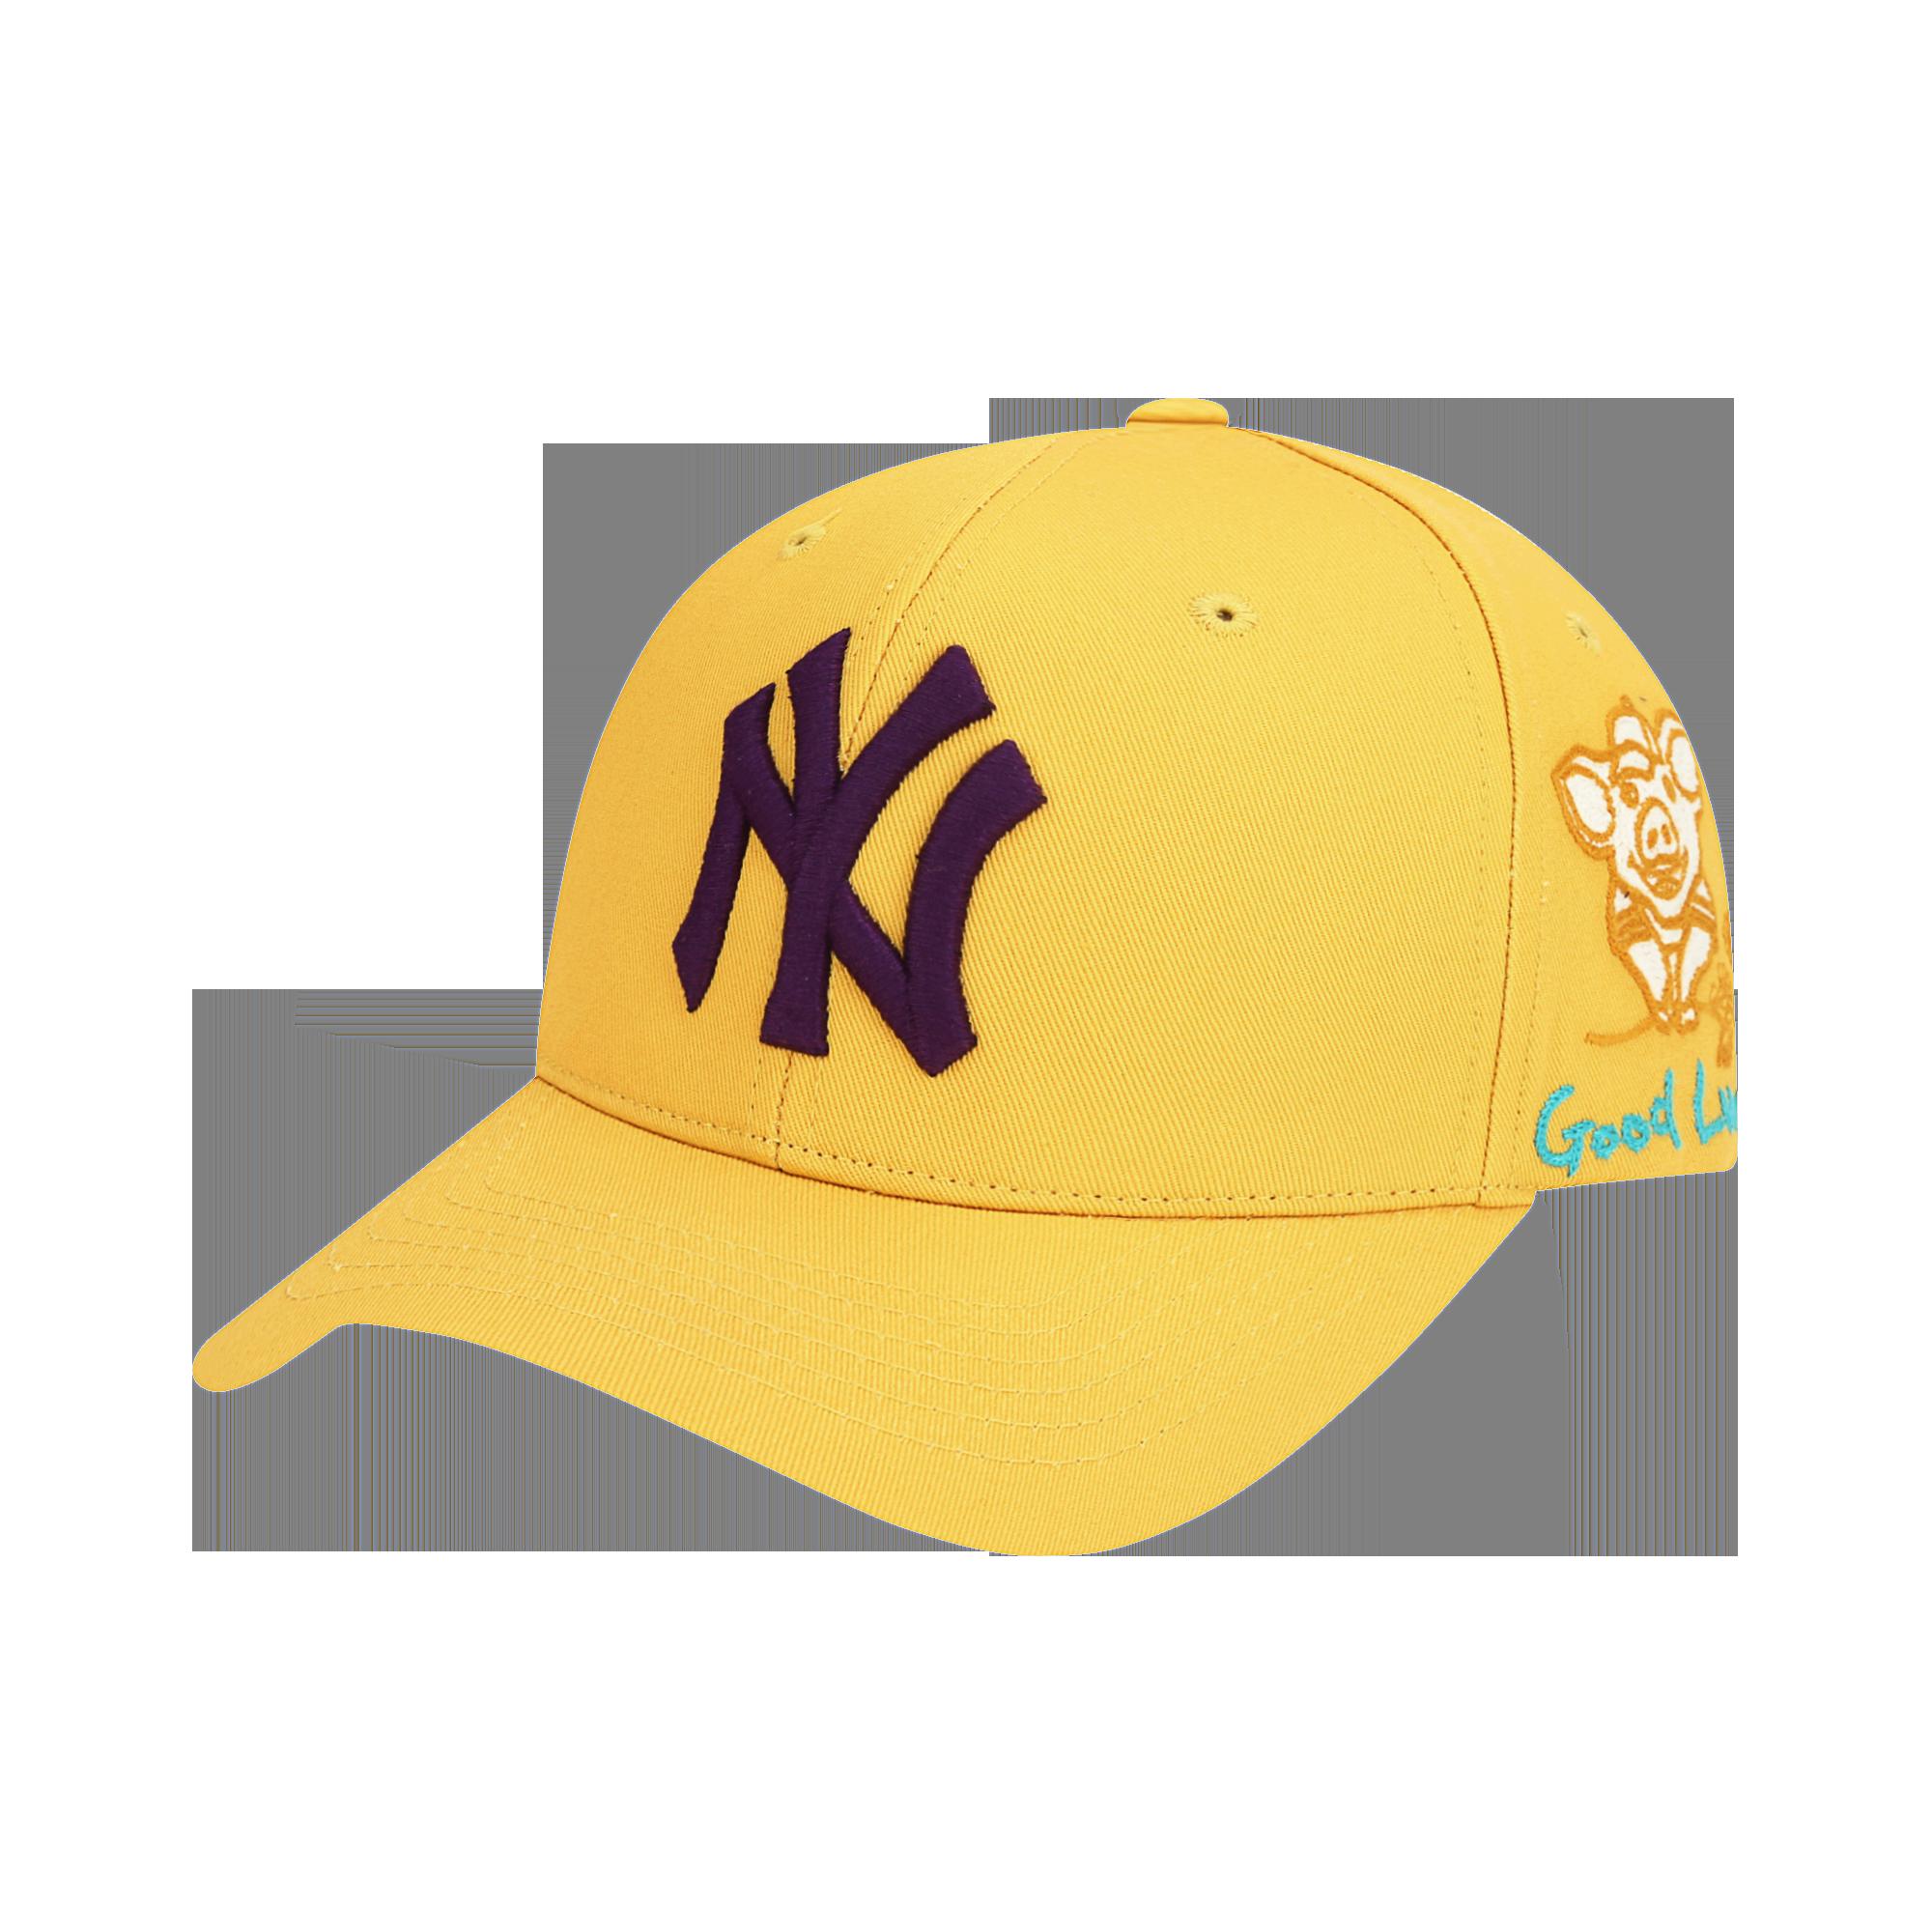 NEW YORK YANKEES GOOD LUCK CHARACTER ADJUSTABLE CAP